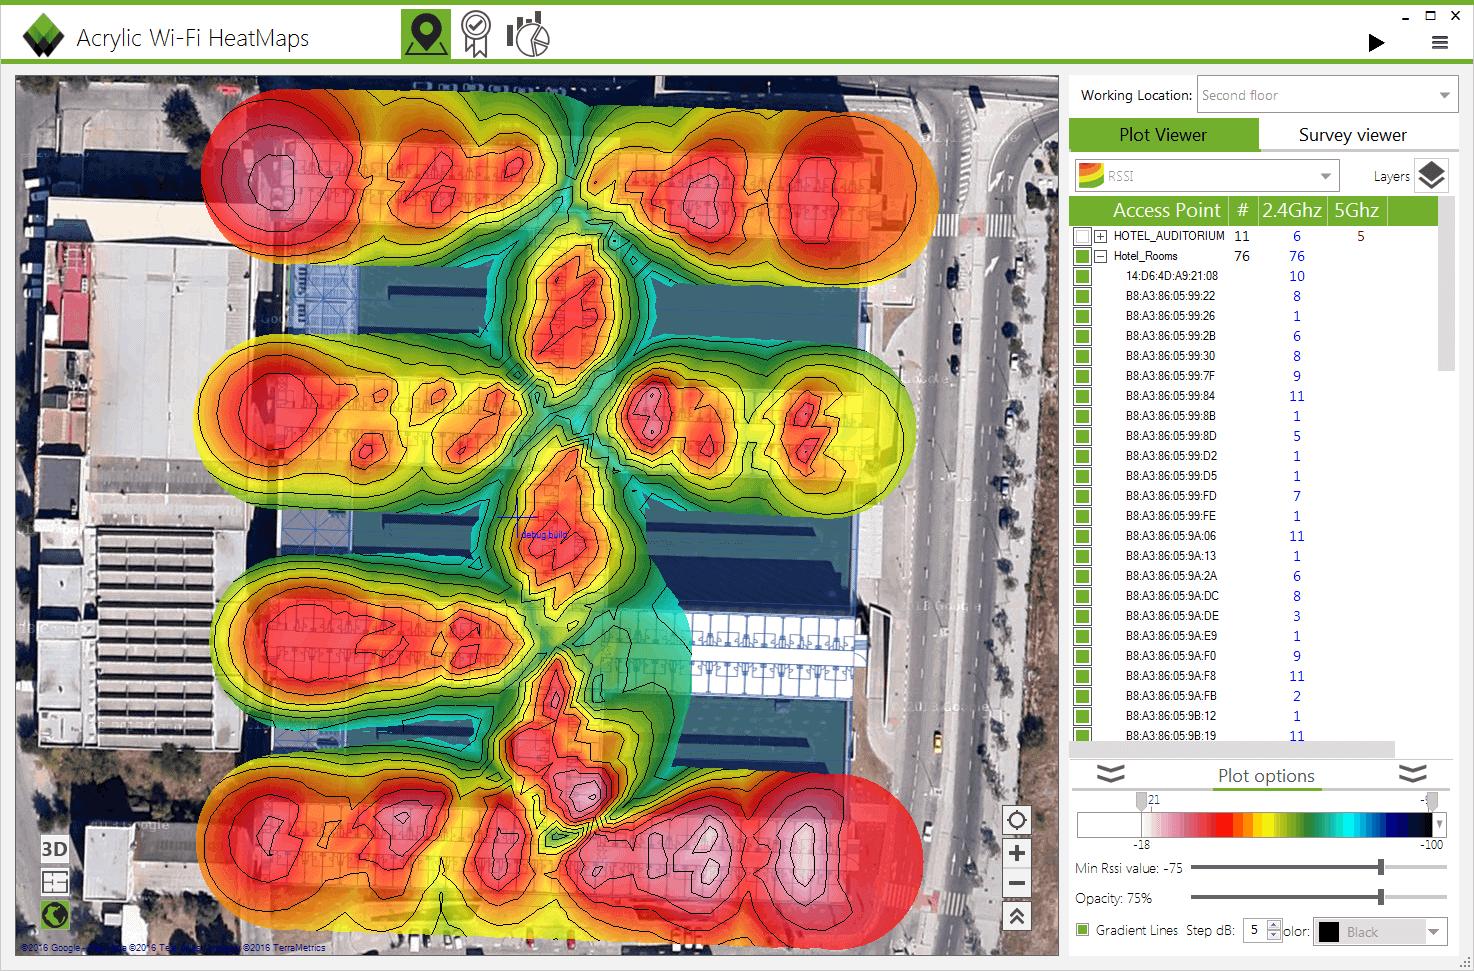 Introducing Acrylic WiFi Heatmaps v3: site survey software